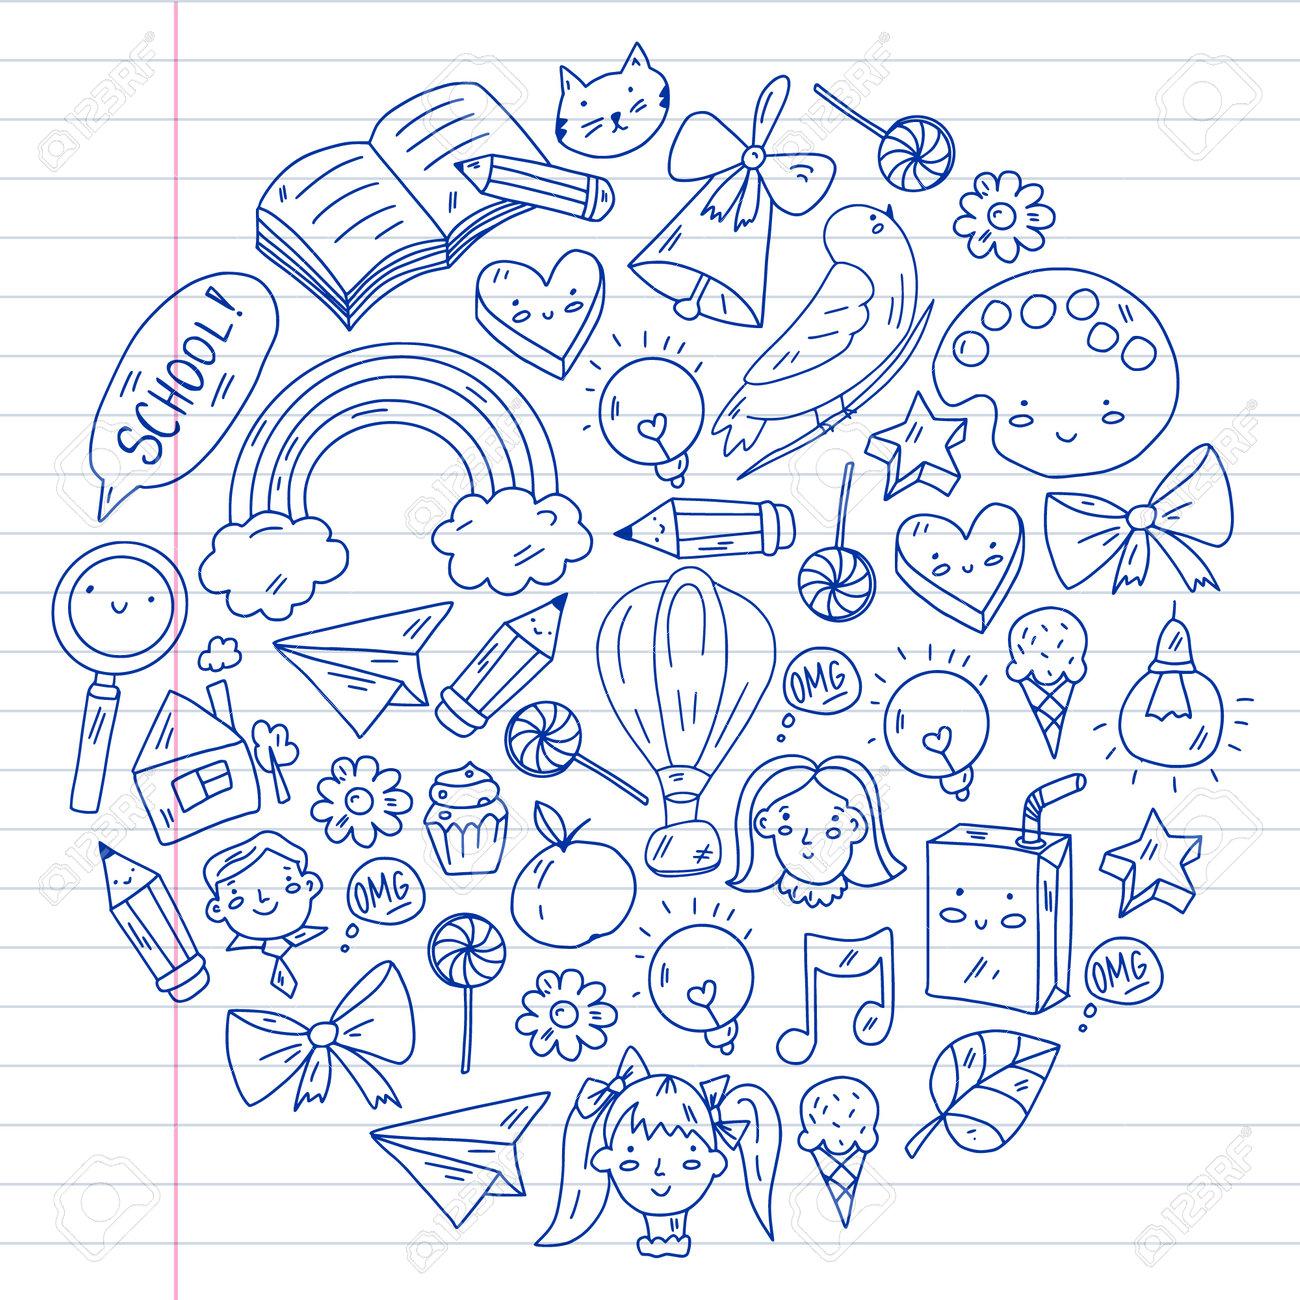 School, kindergarten with cute vector children. Creativity and imagination. Dancing, singing, painting, online education. - 173370336